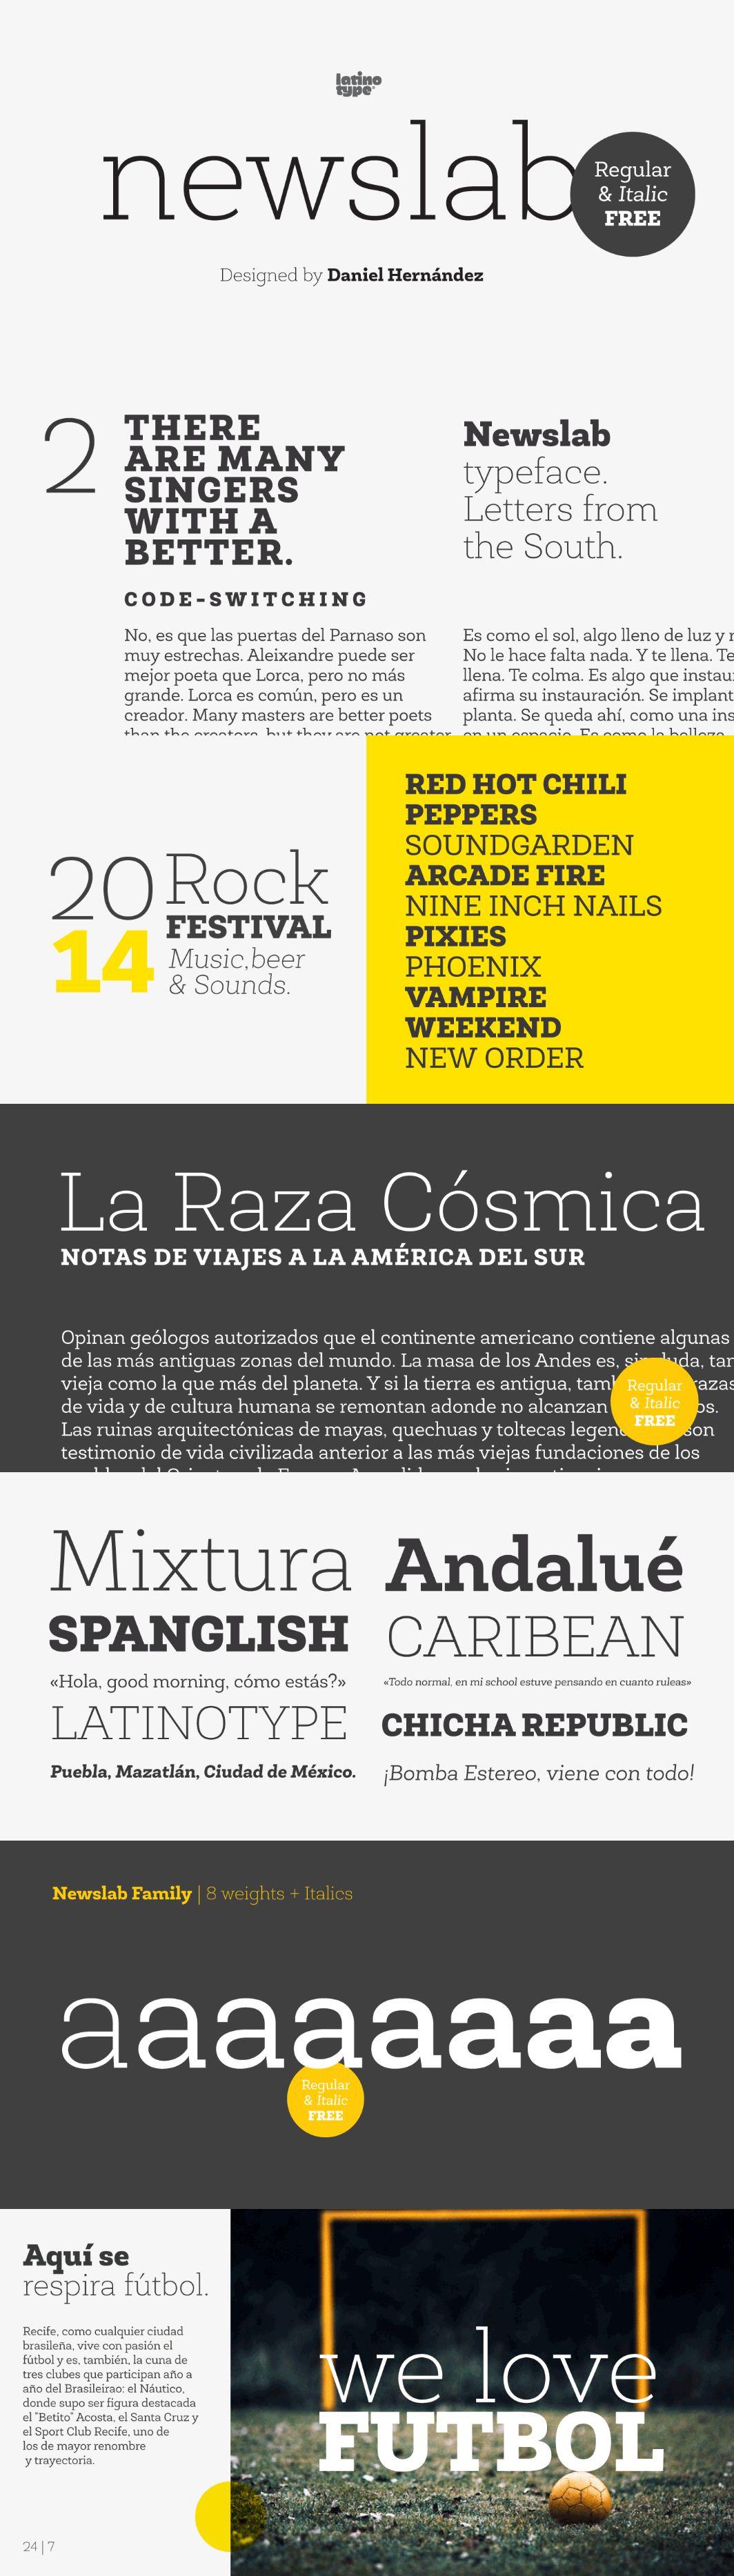 newslab font